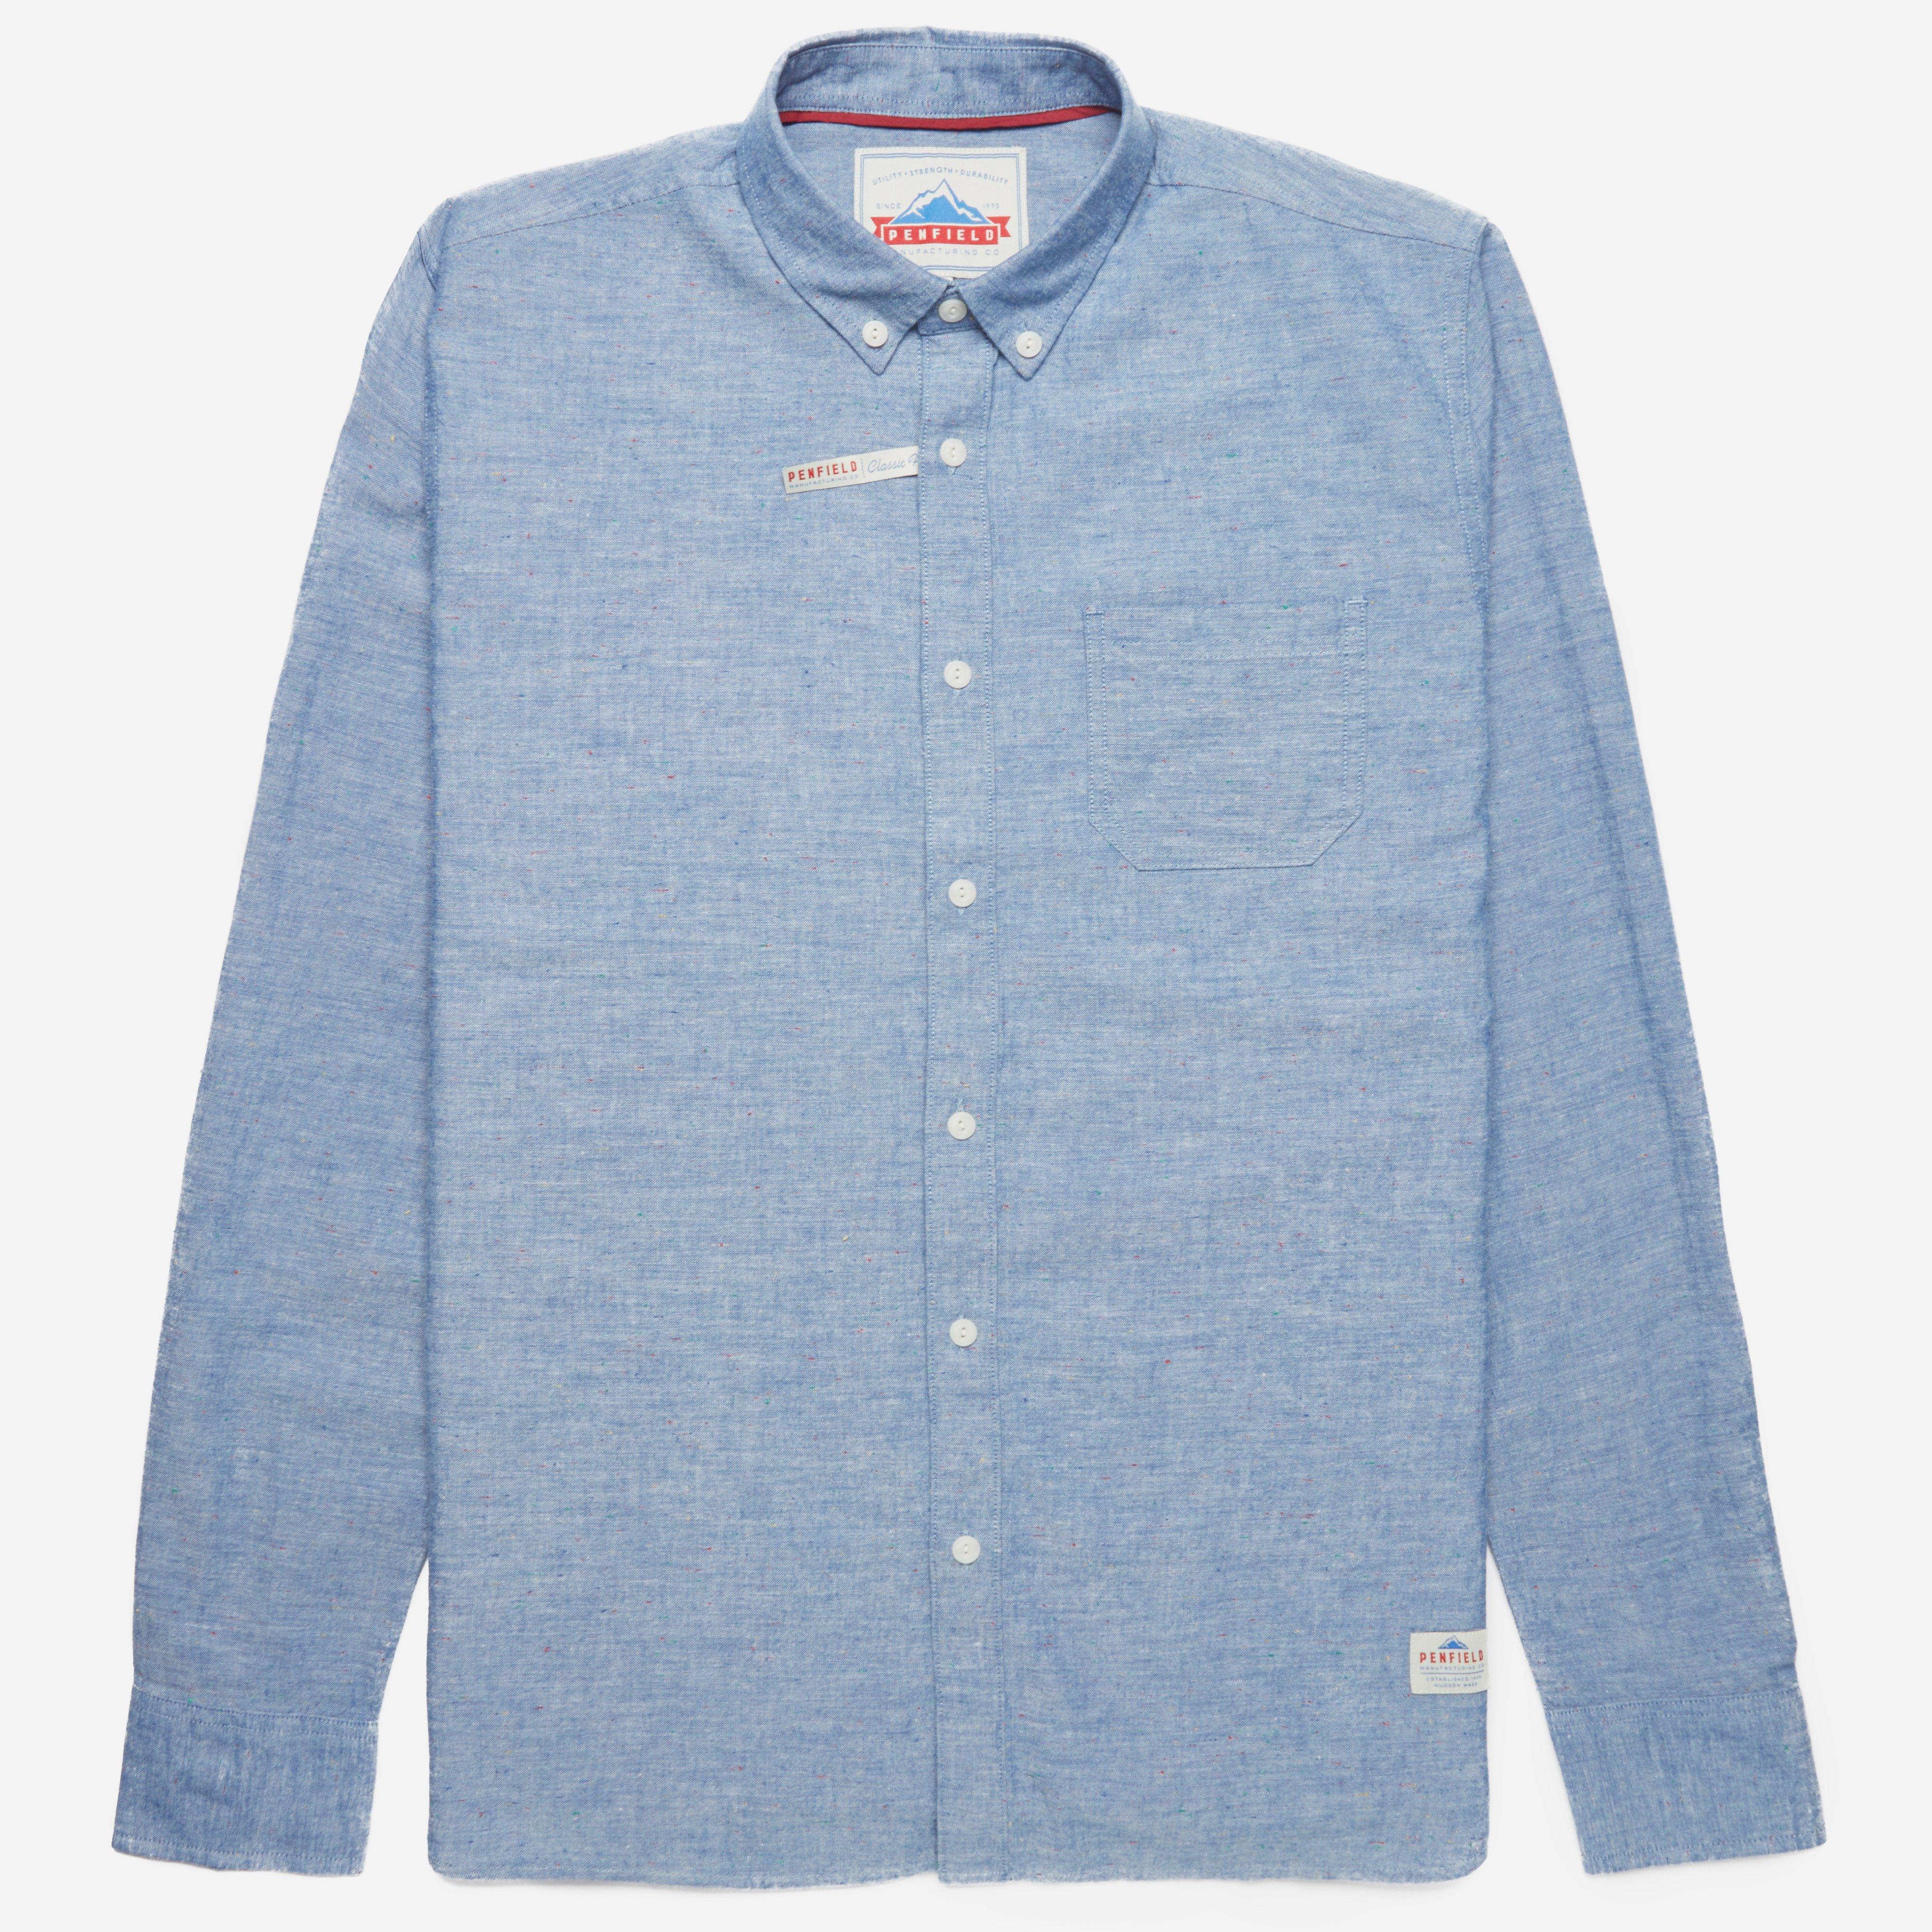 Penfield Hadley Shirt